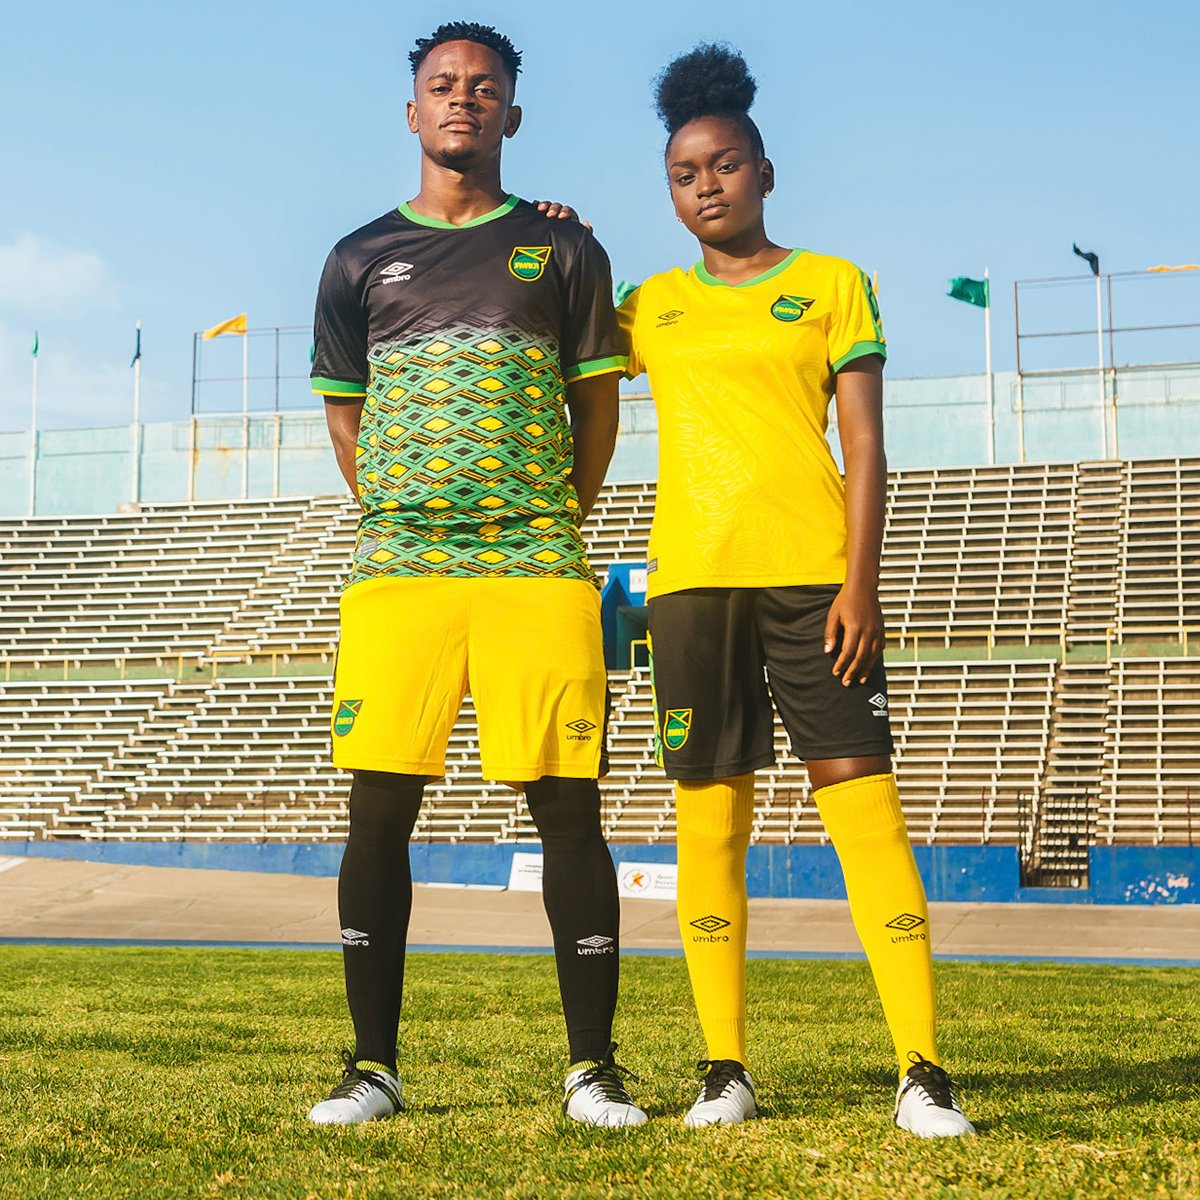 outstanding-umbro-jamaica-18-19-home-away-kits+%252811%2529.jpg